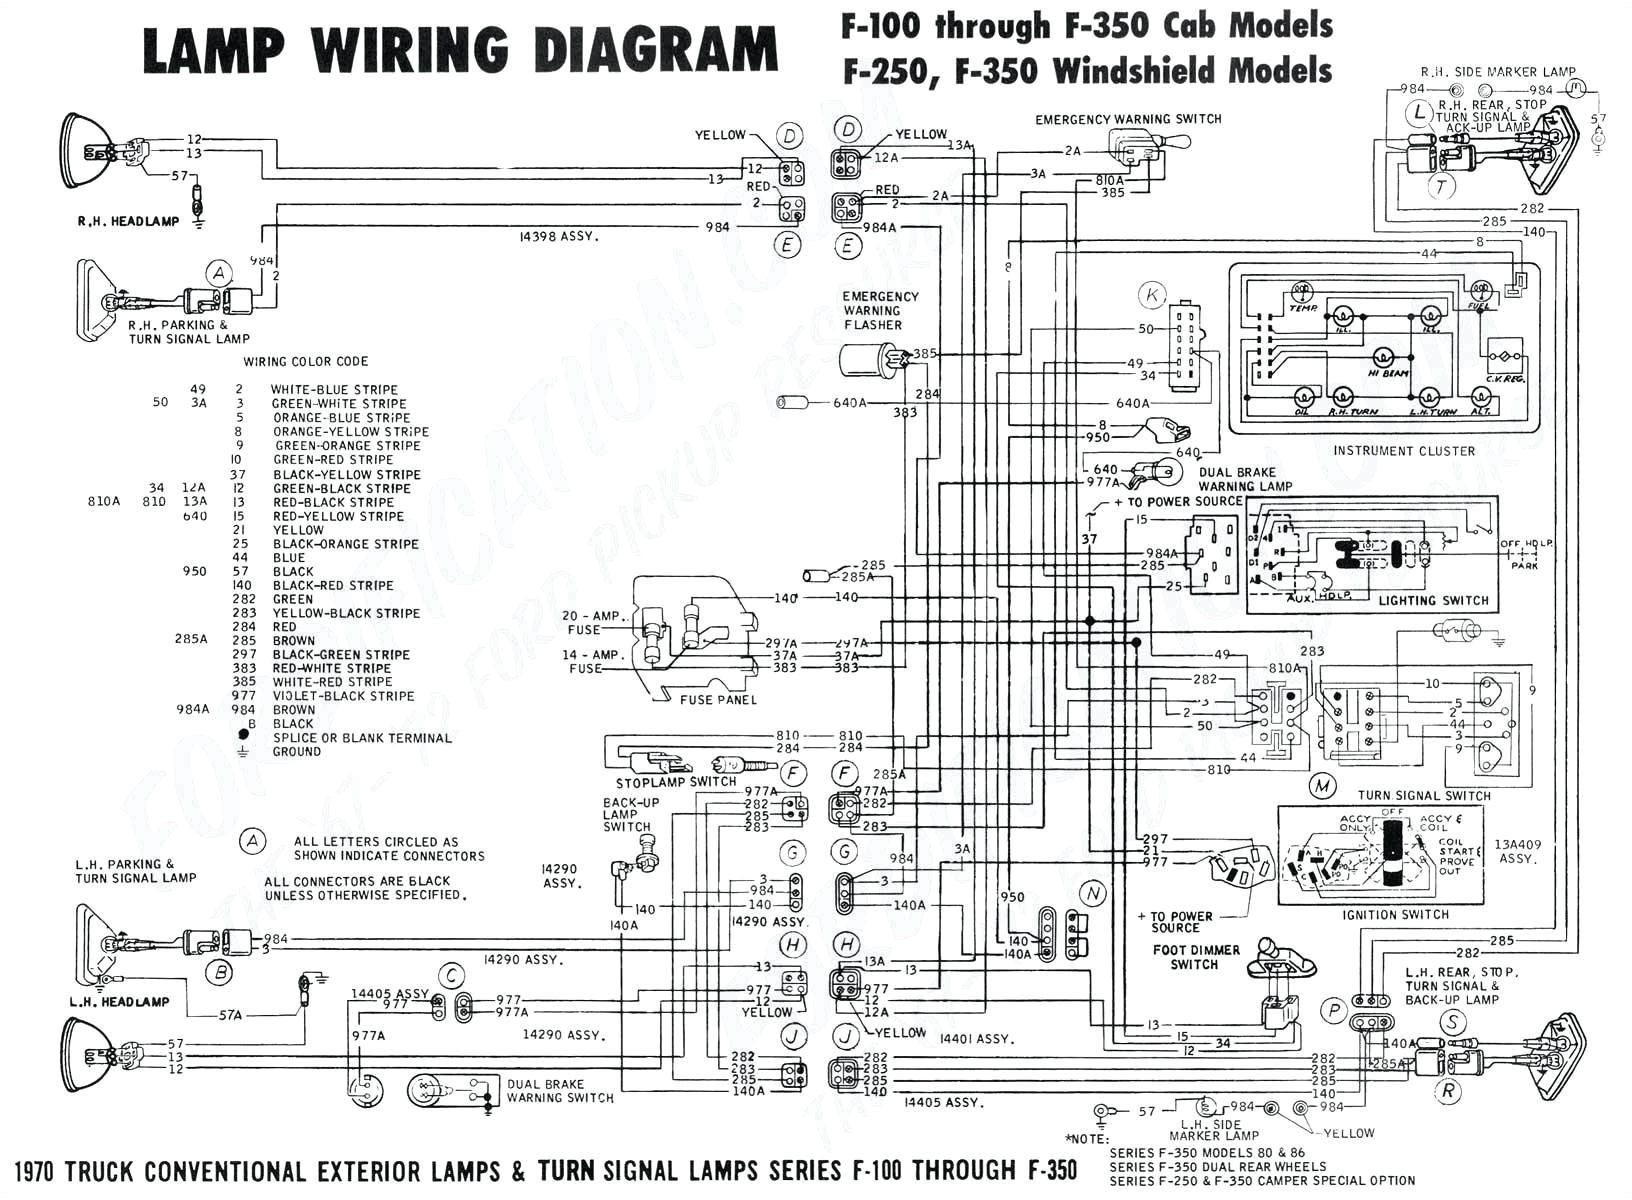 Western Cable Plow Wiring Diagram Western Plow Wiring Diagram Wiring Diagram Database